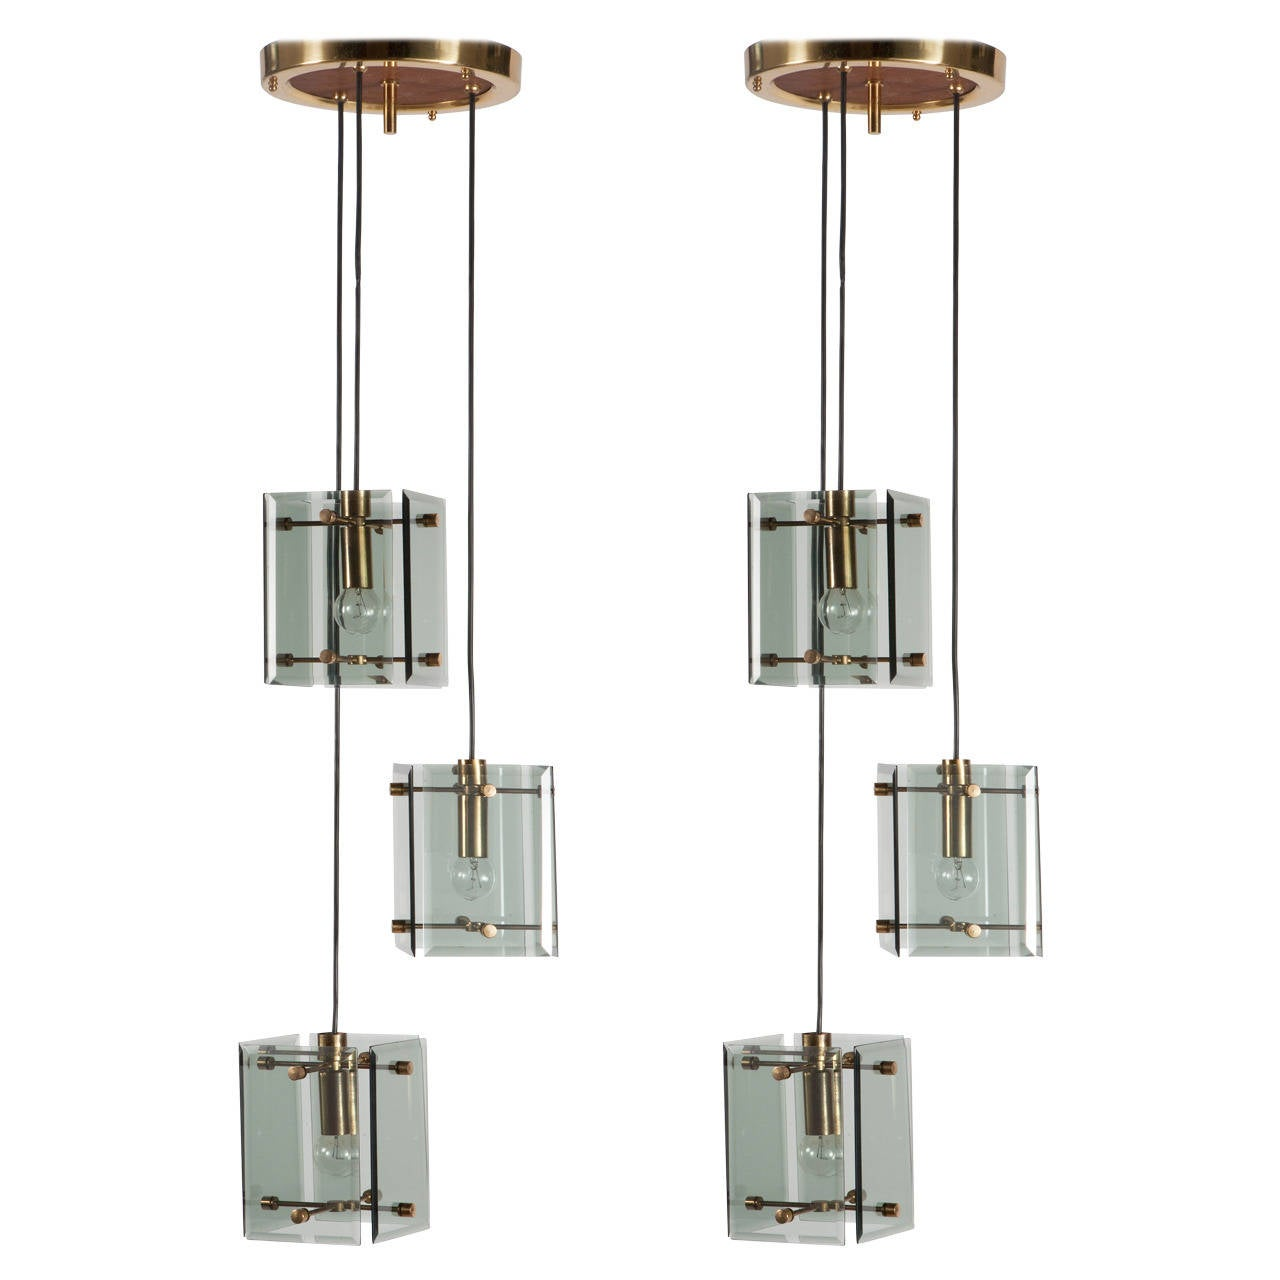 1960 Novelty Lighting : Pair of 1960s Max Ingrand Style Pendant Lights at 1stdibs